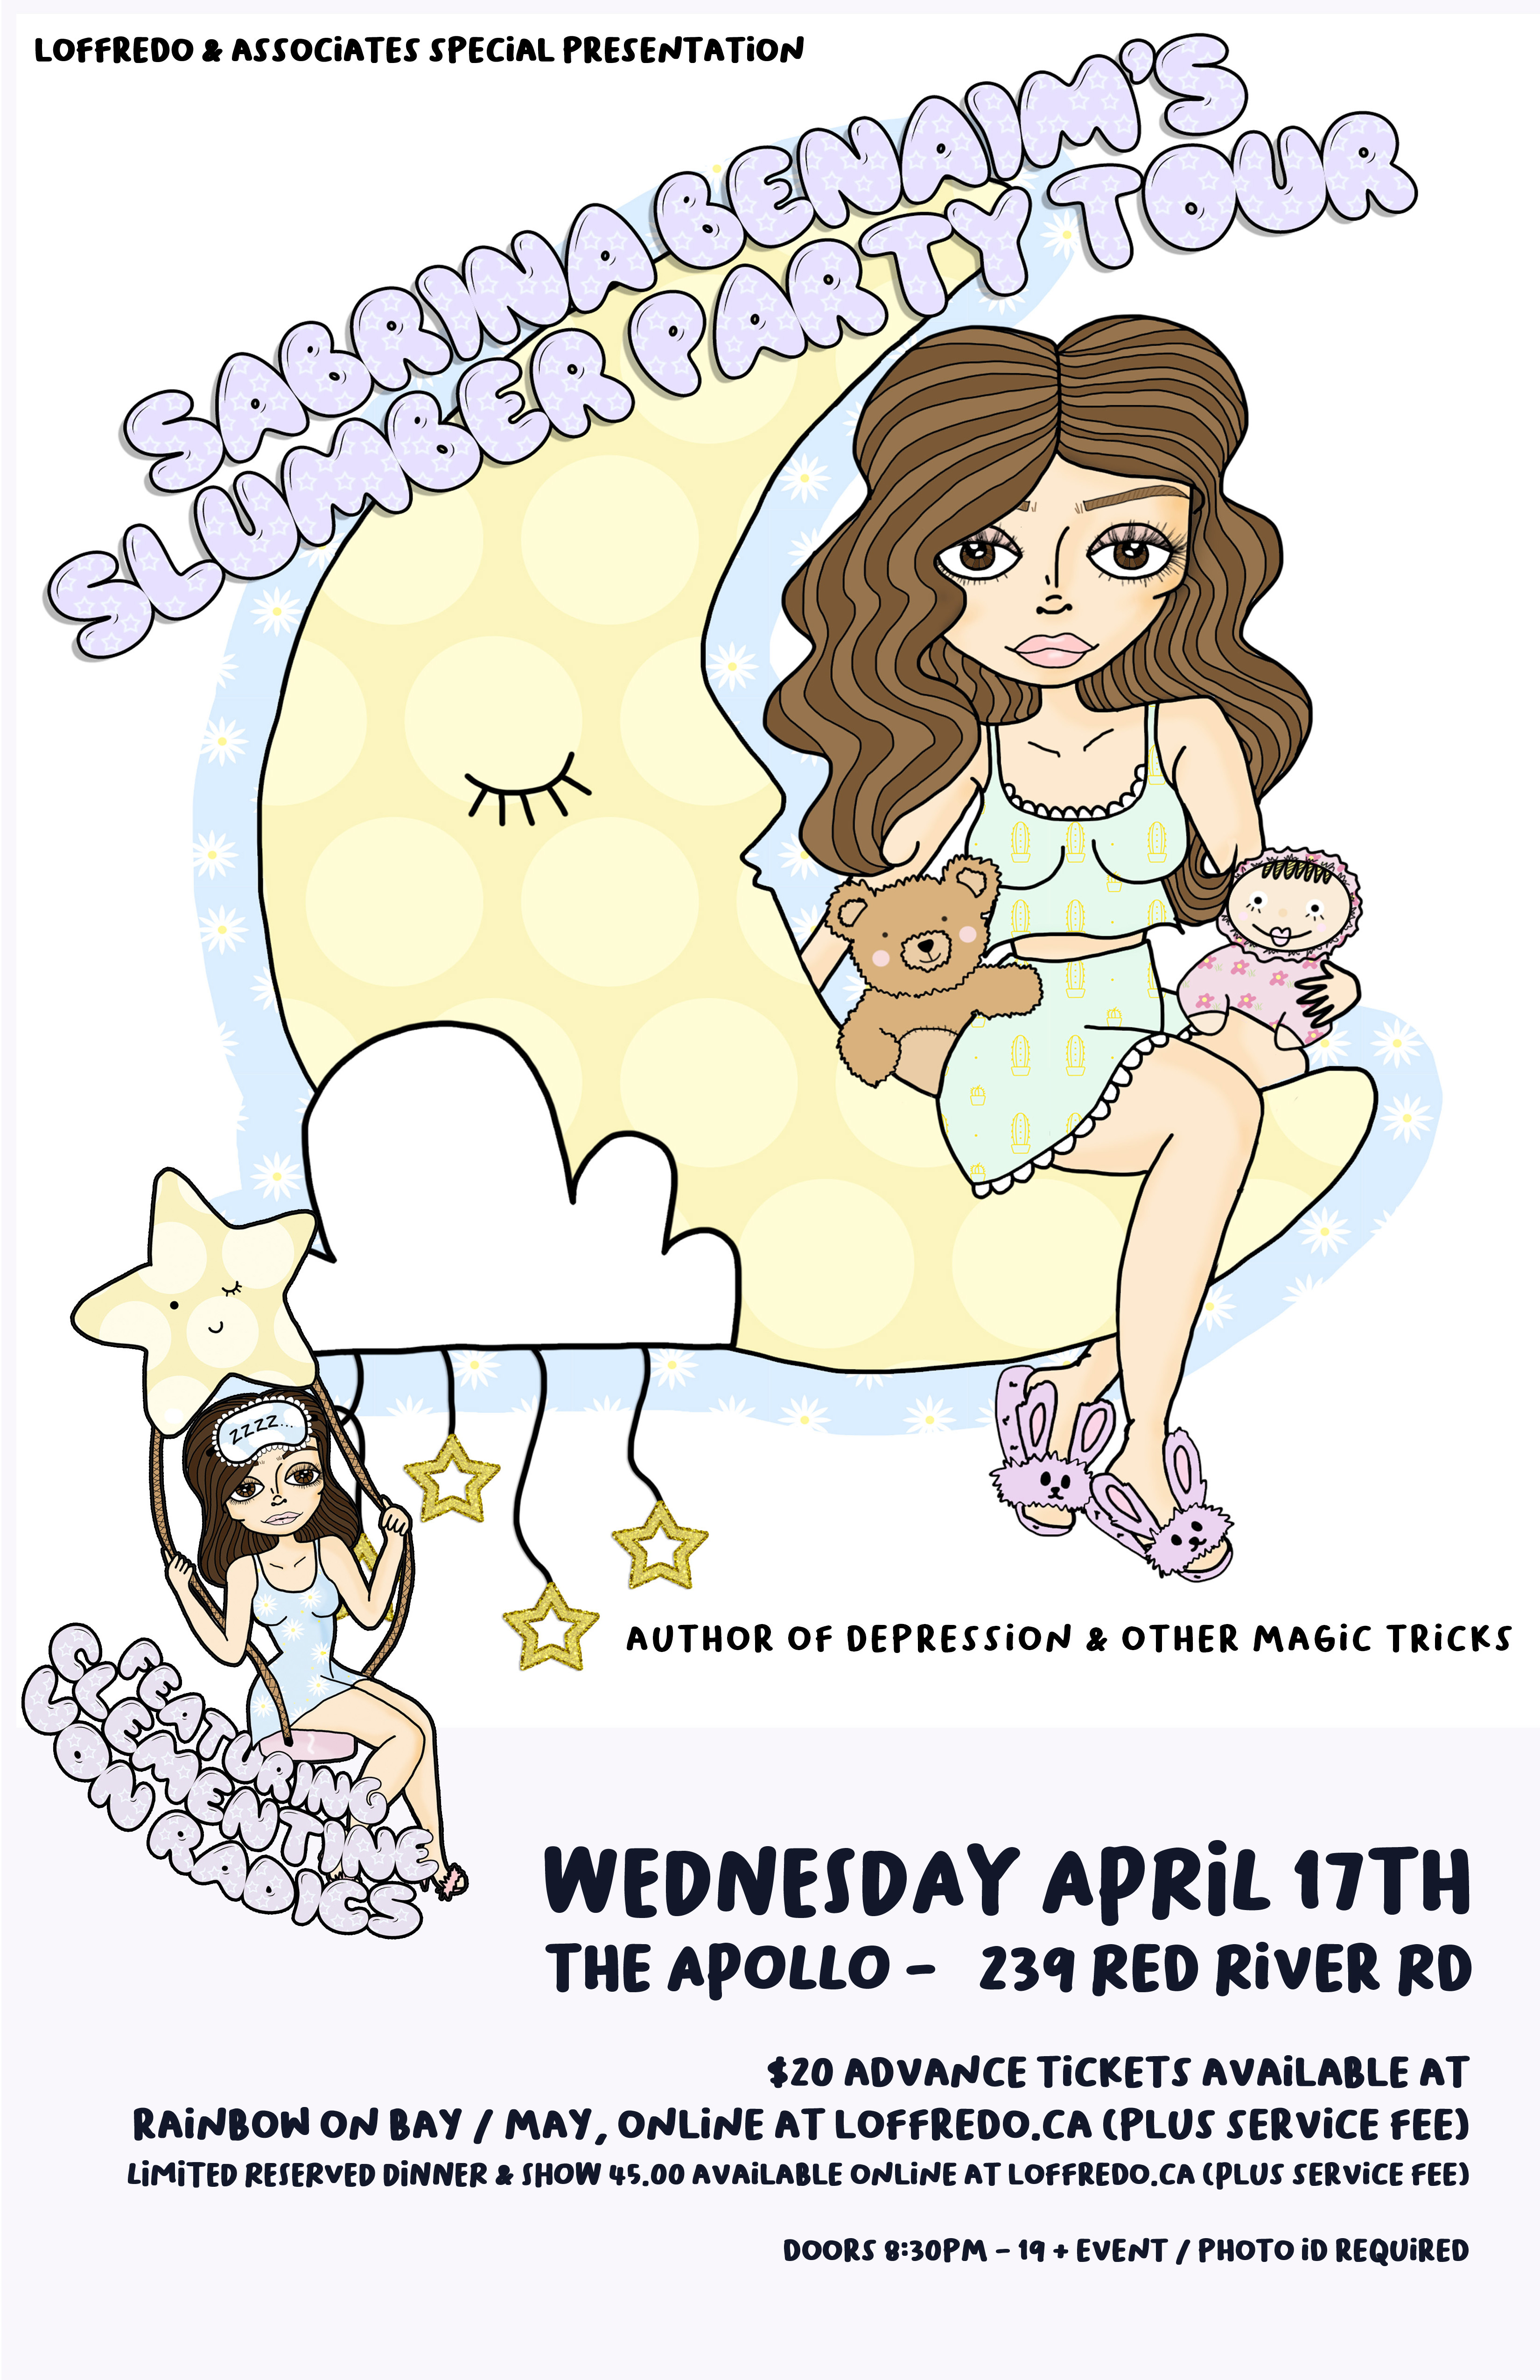 Sabrina Benaim - The Slumber Party Tour - April 18th at Urban Abbey 00285